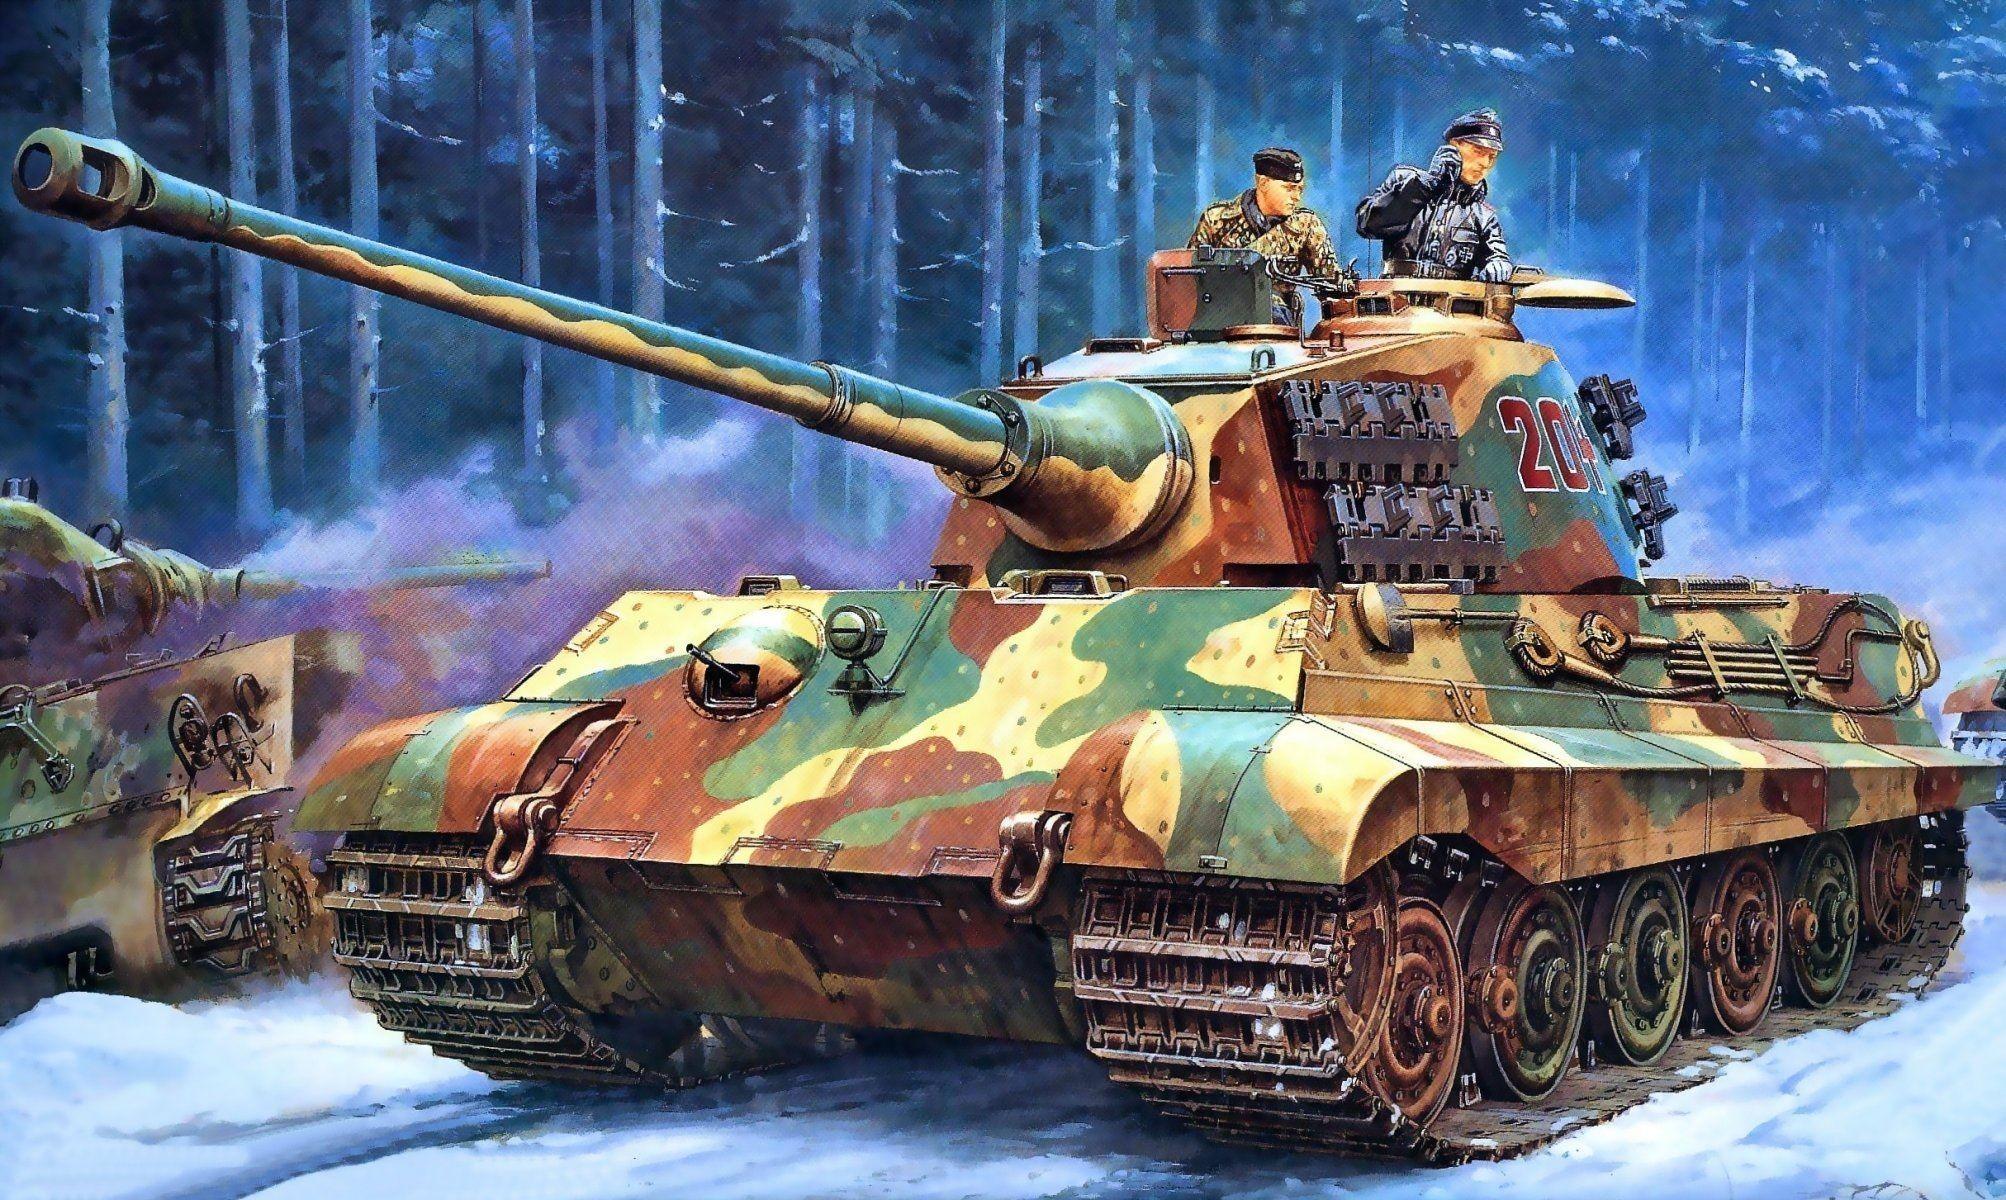 Res: 2006x1200, Tiger Tank Wallpaper Laptop